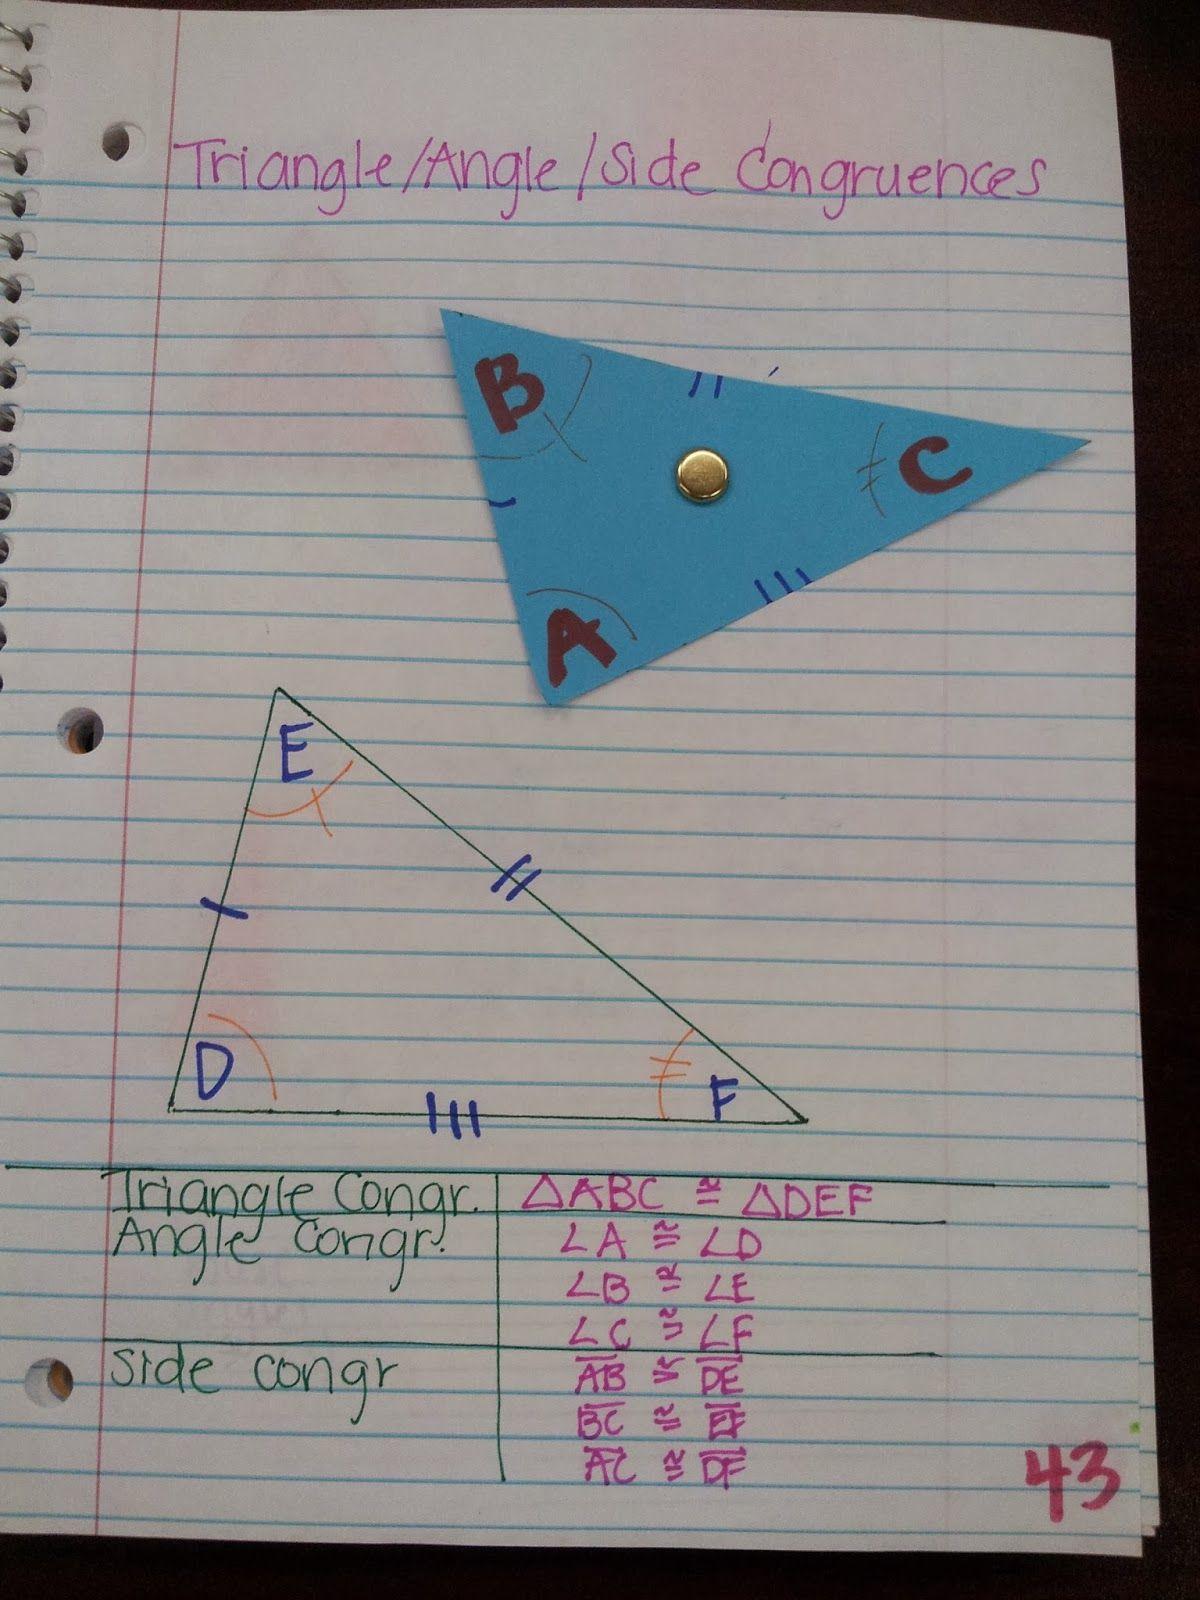 Fresh Ideas - Kelsoe Math Triangles Writing Congruence Statements